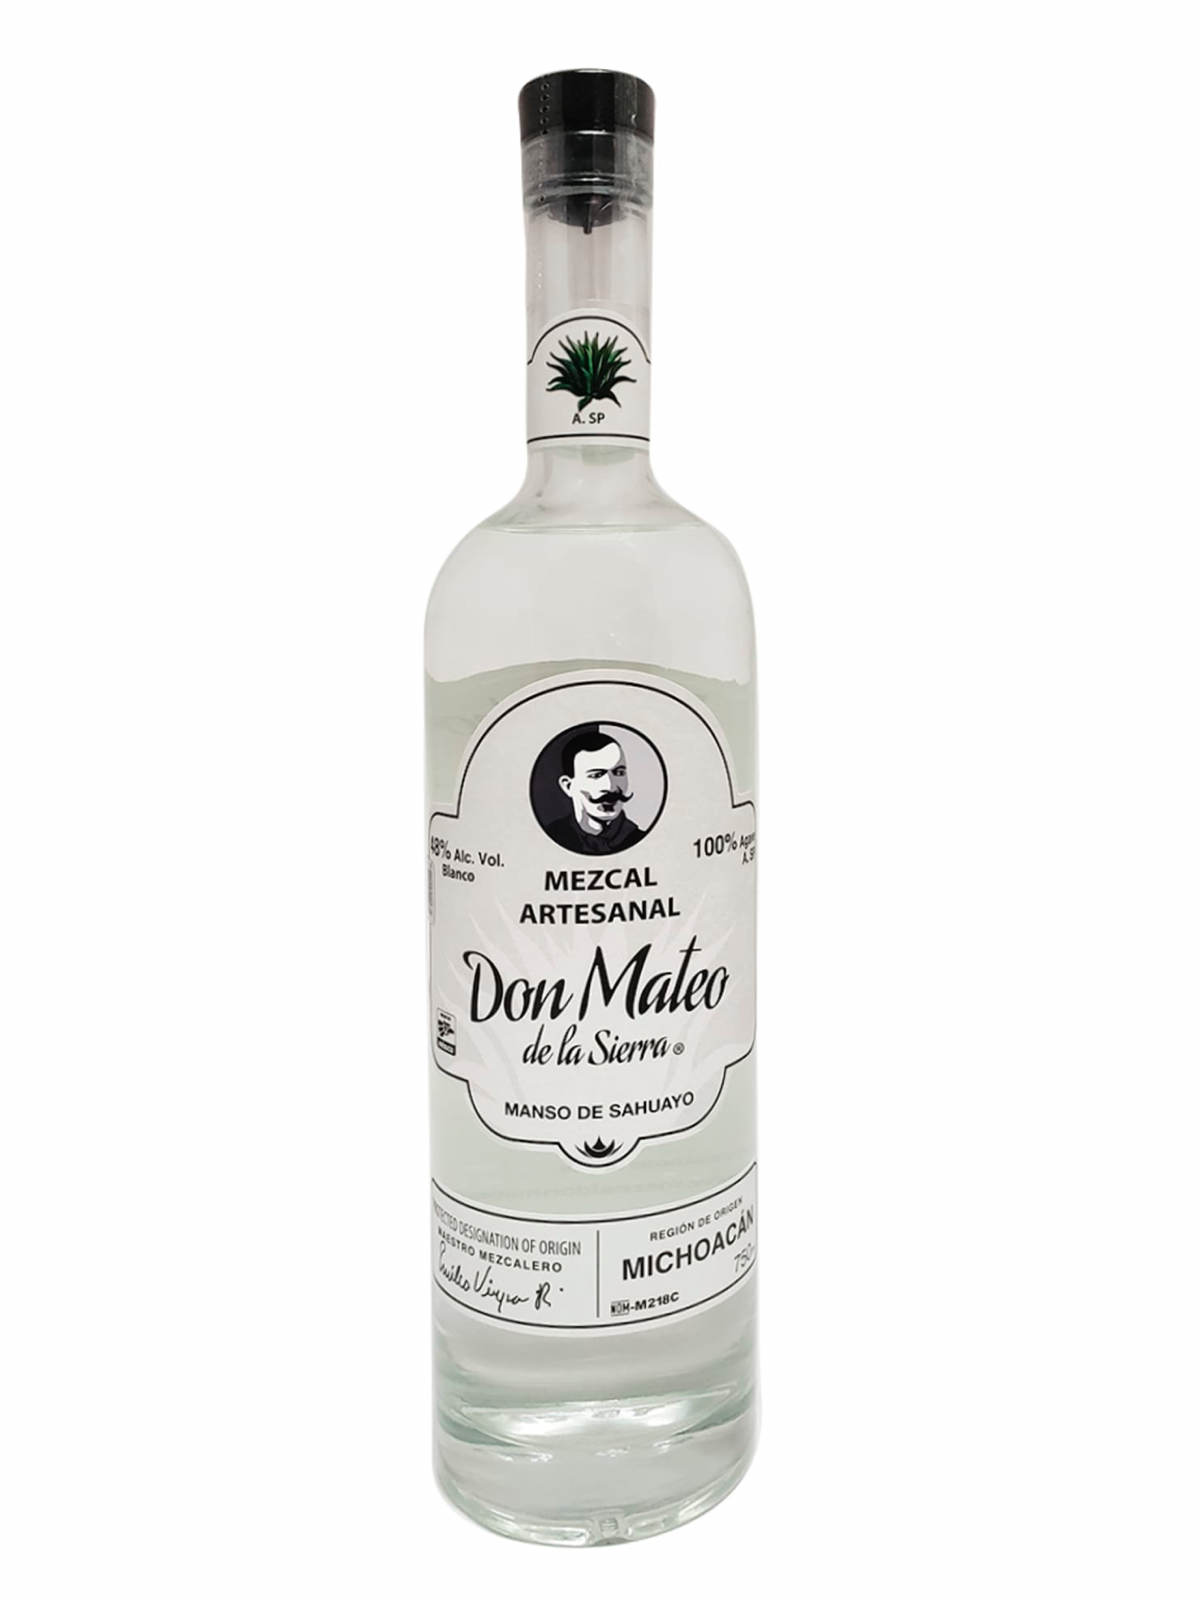 Don Mateo Manso de Sahuayo bottle